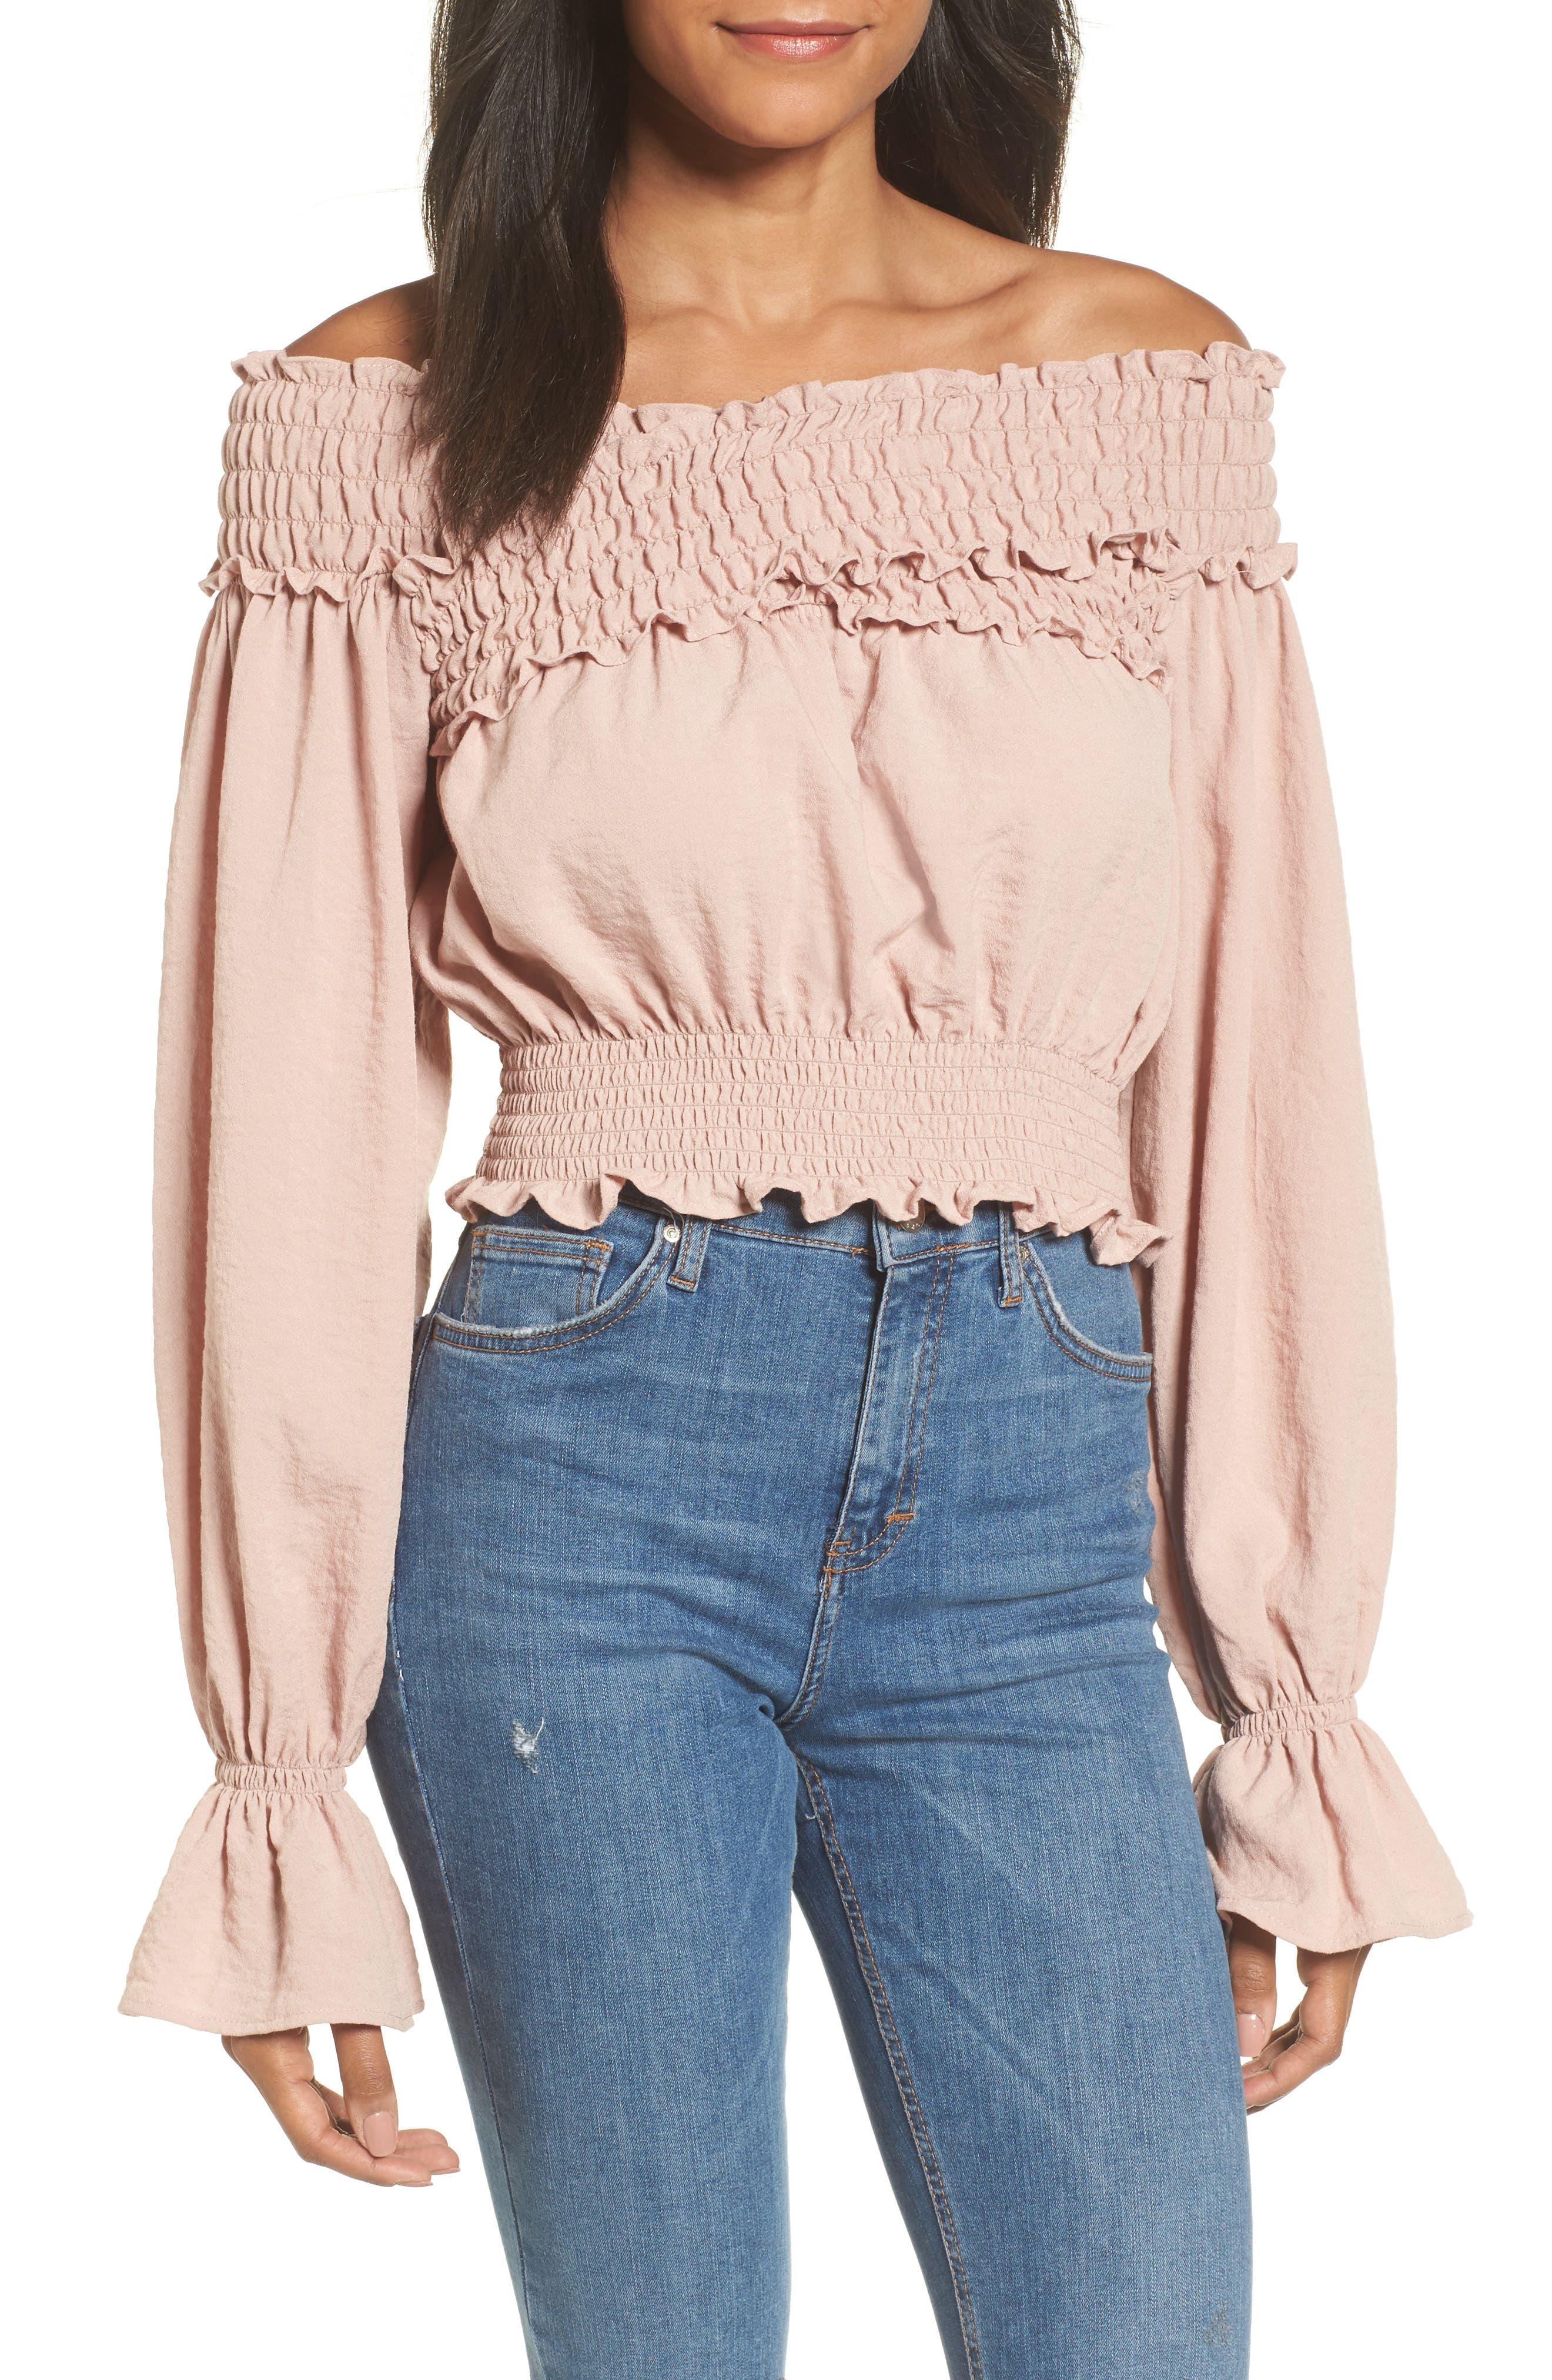 Delany Off the Shoulder Crop Top,                         Main,                         color, Primrose Pink